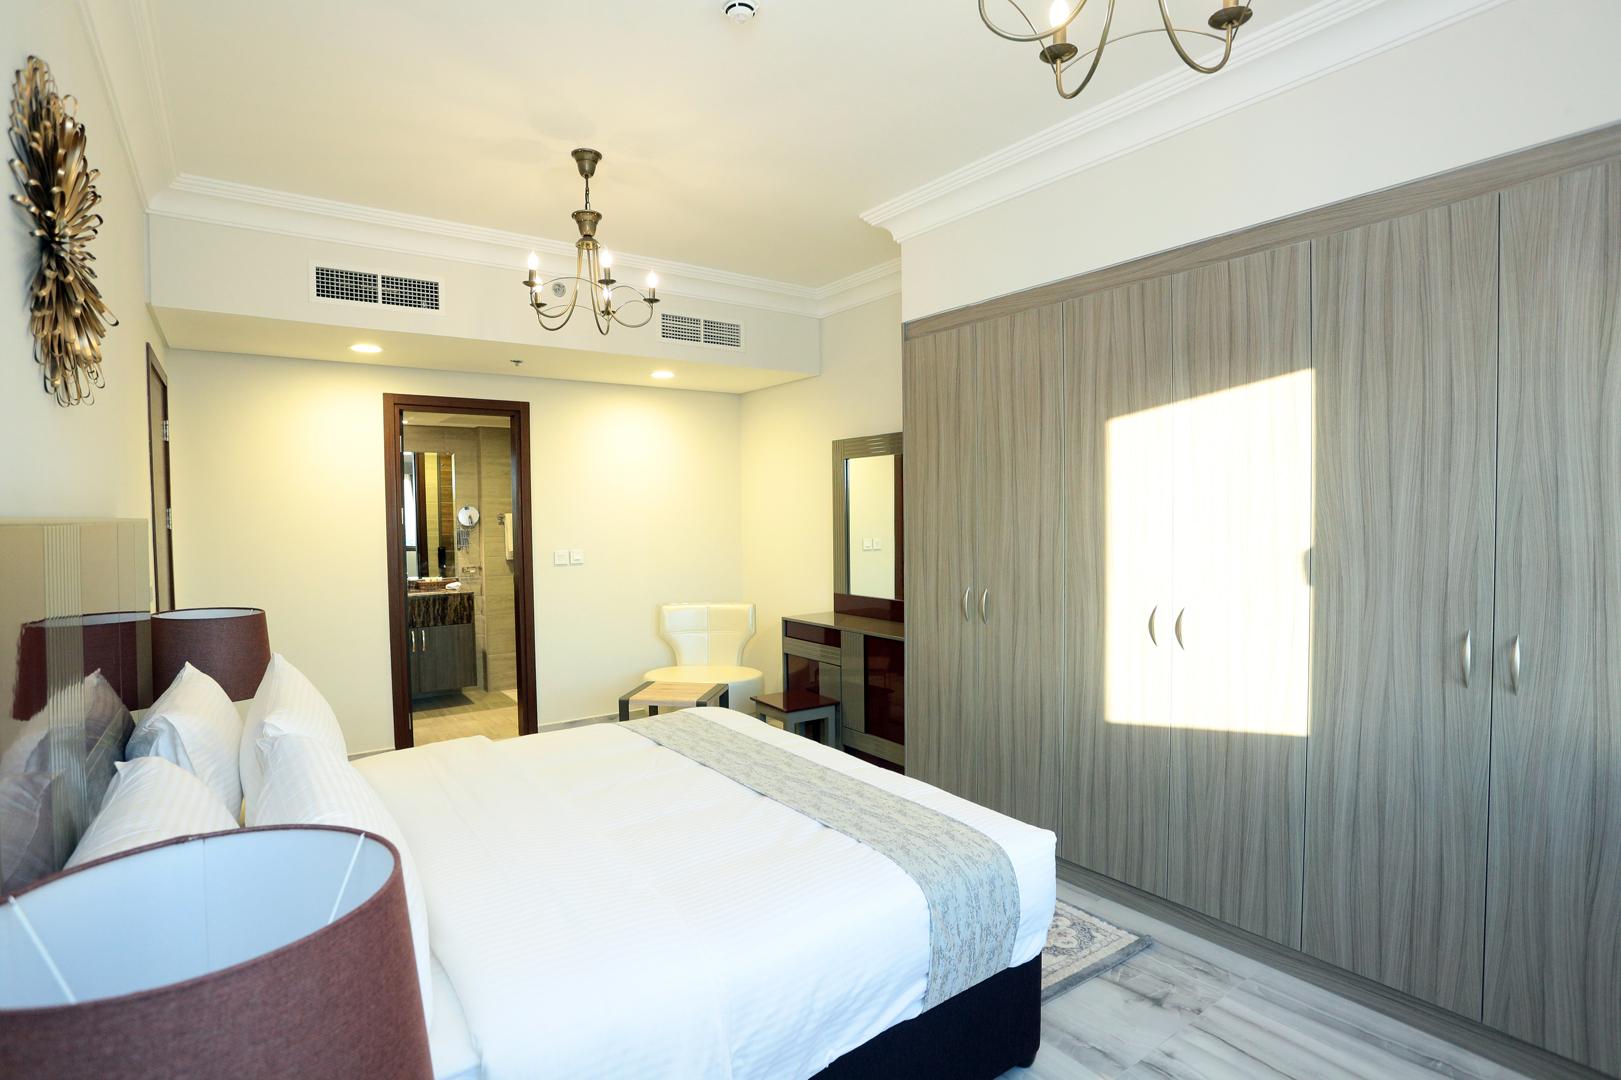 Apartment Marbella Luxury 2 bedrooms photo 27263083